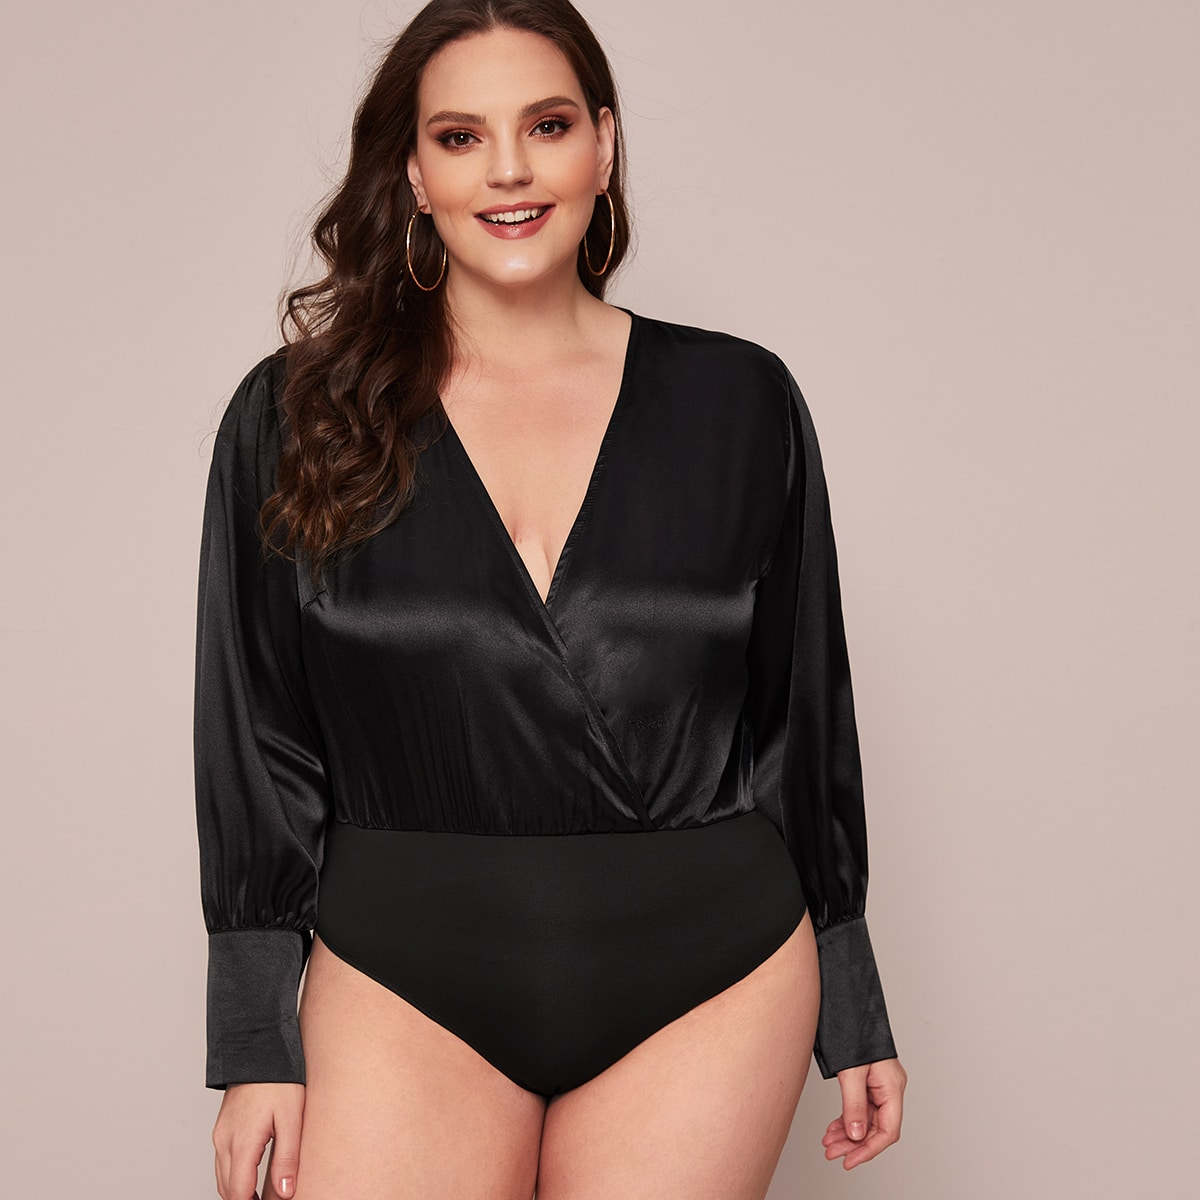 Zwart Elegant Vlak Bodysuits grote maten